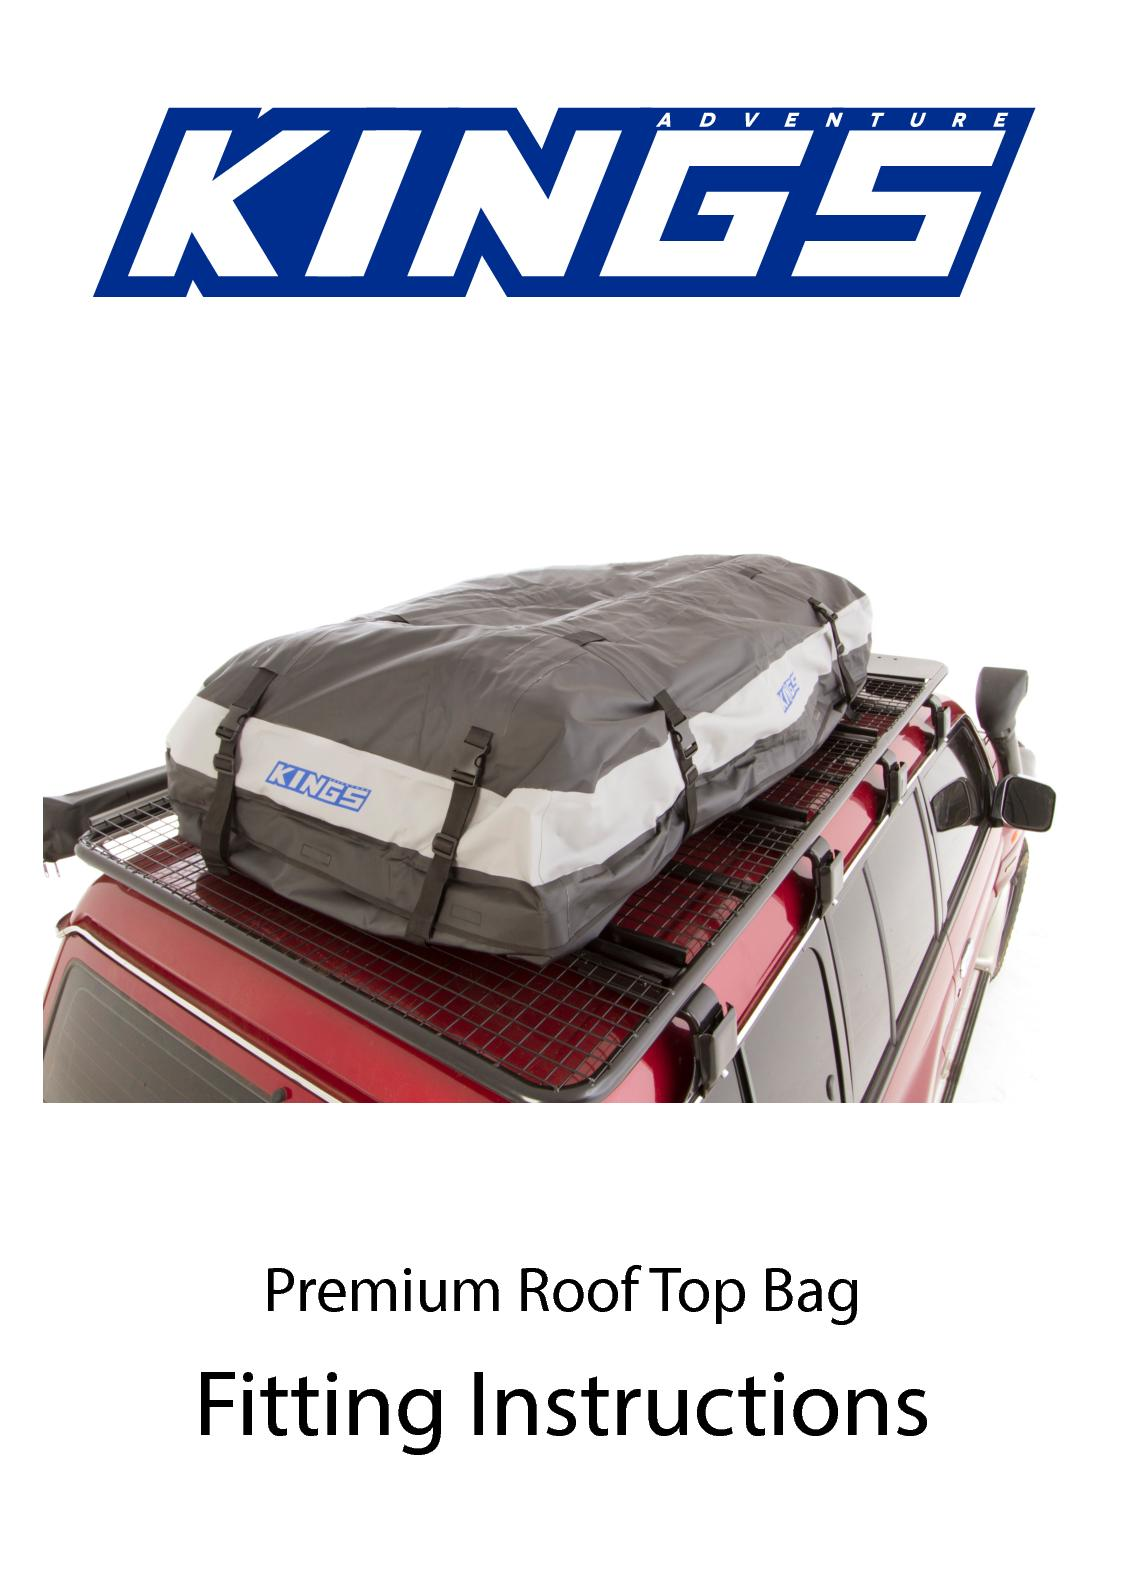 4Wd Supacentre Roof Rack Installation calaméo - premium roof top bag manual 170710